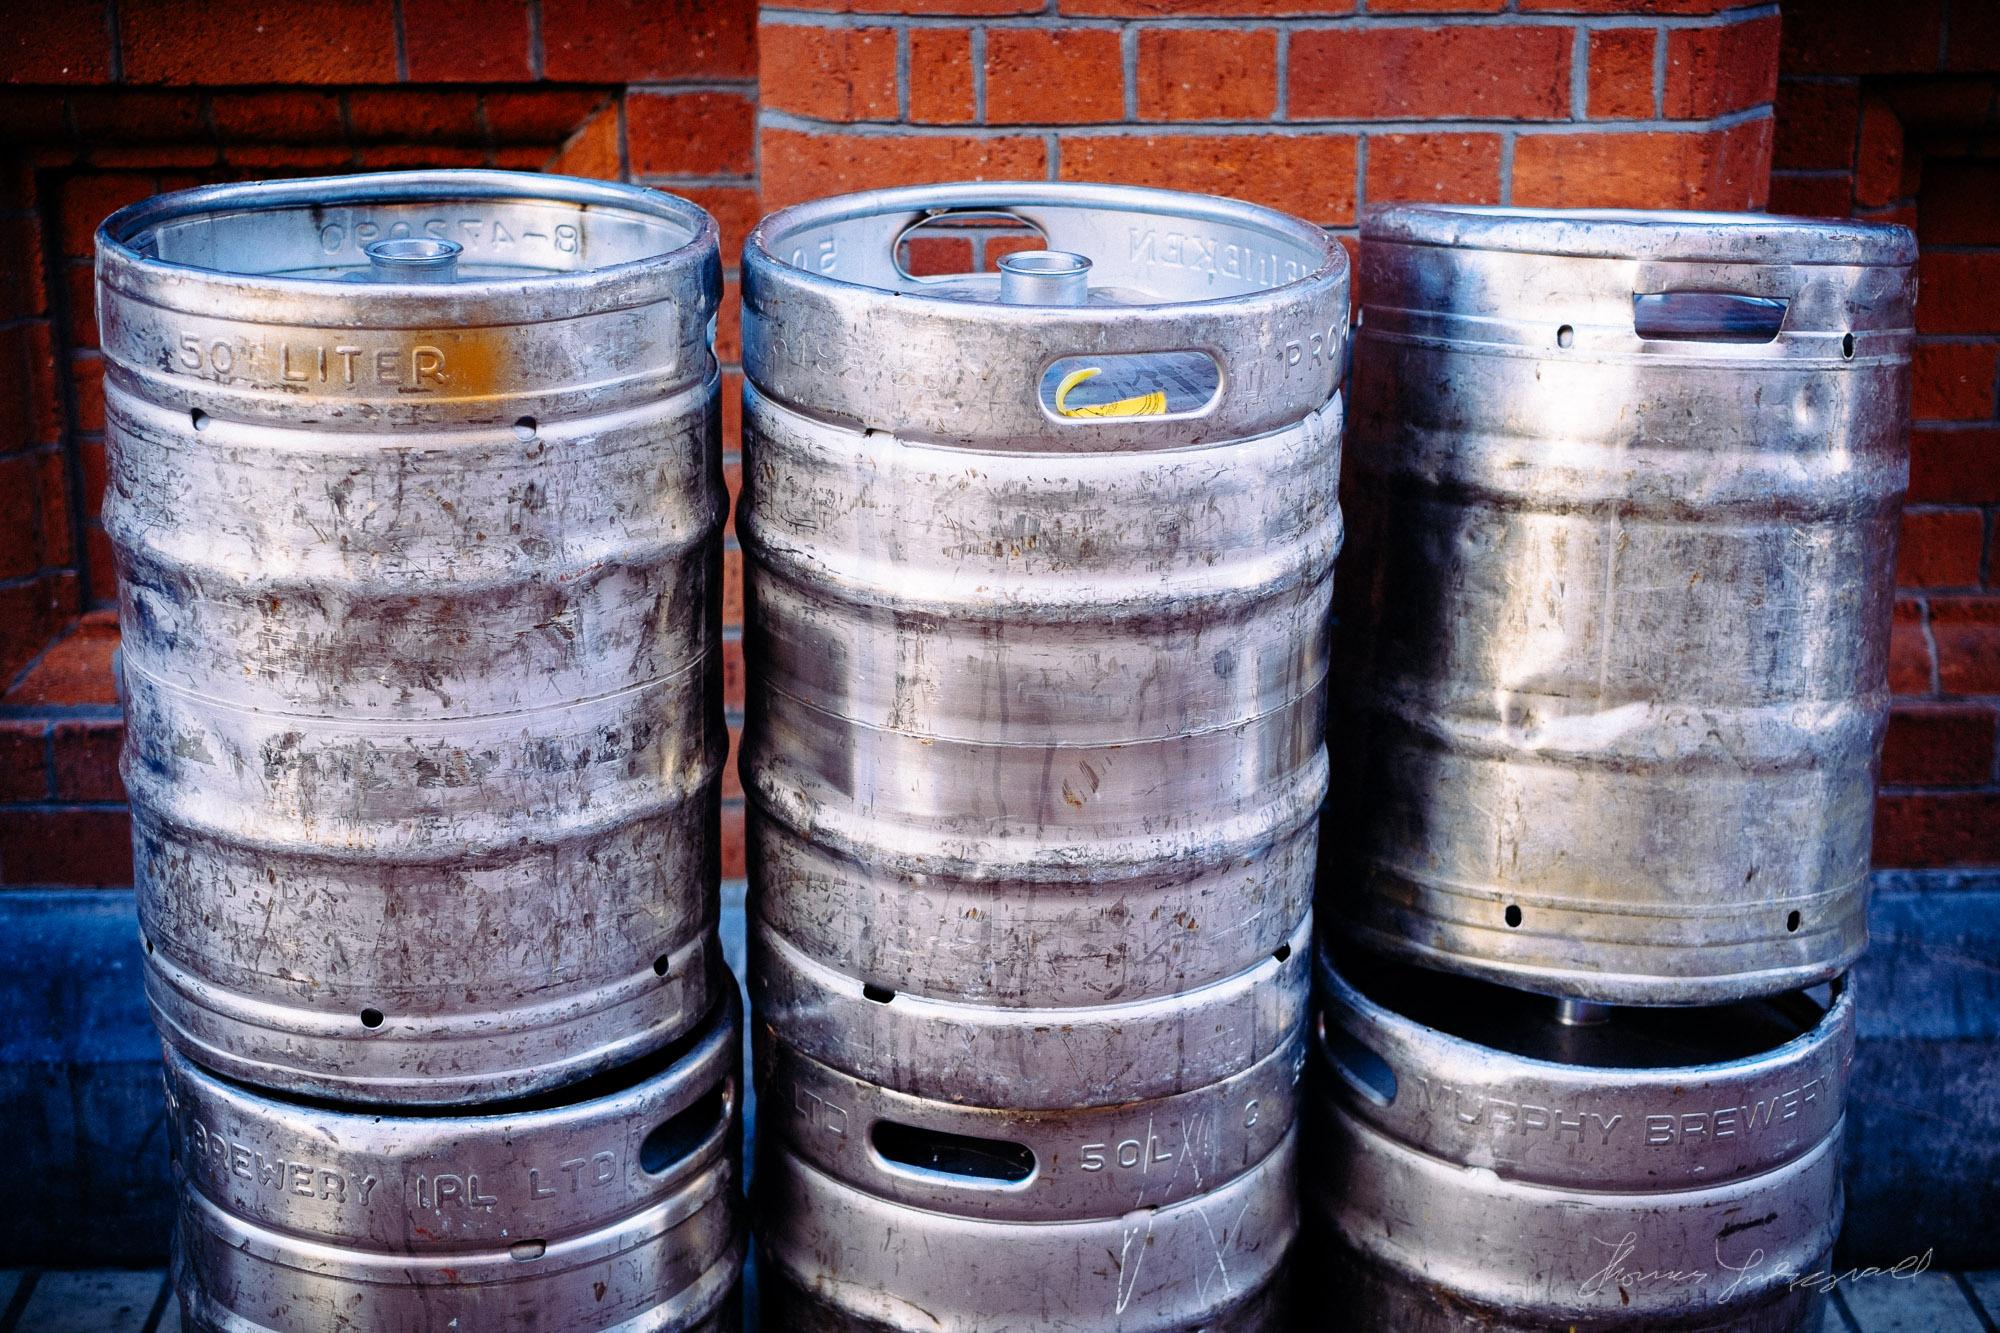 """Beer Kegs"" With Kodak E200 Preset"